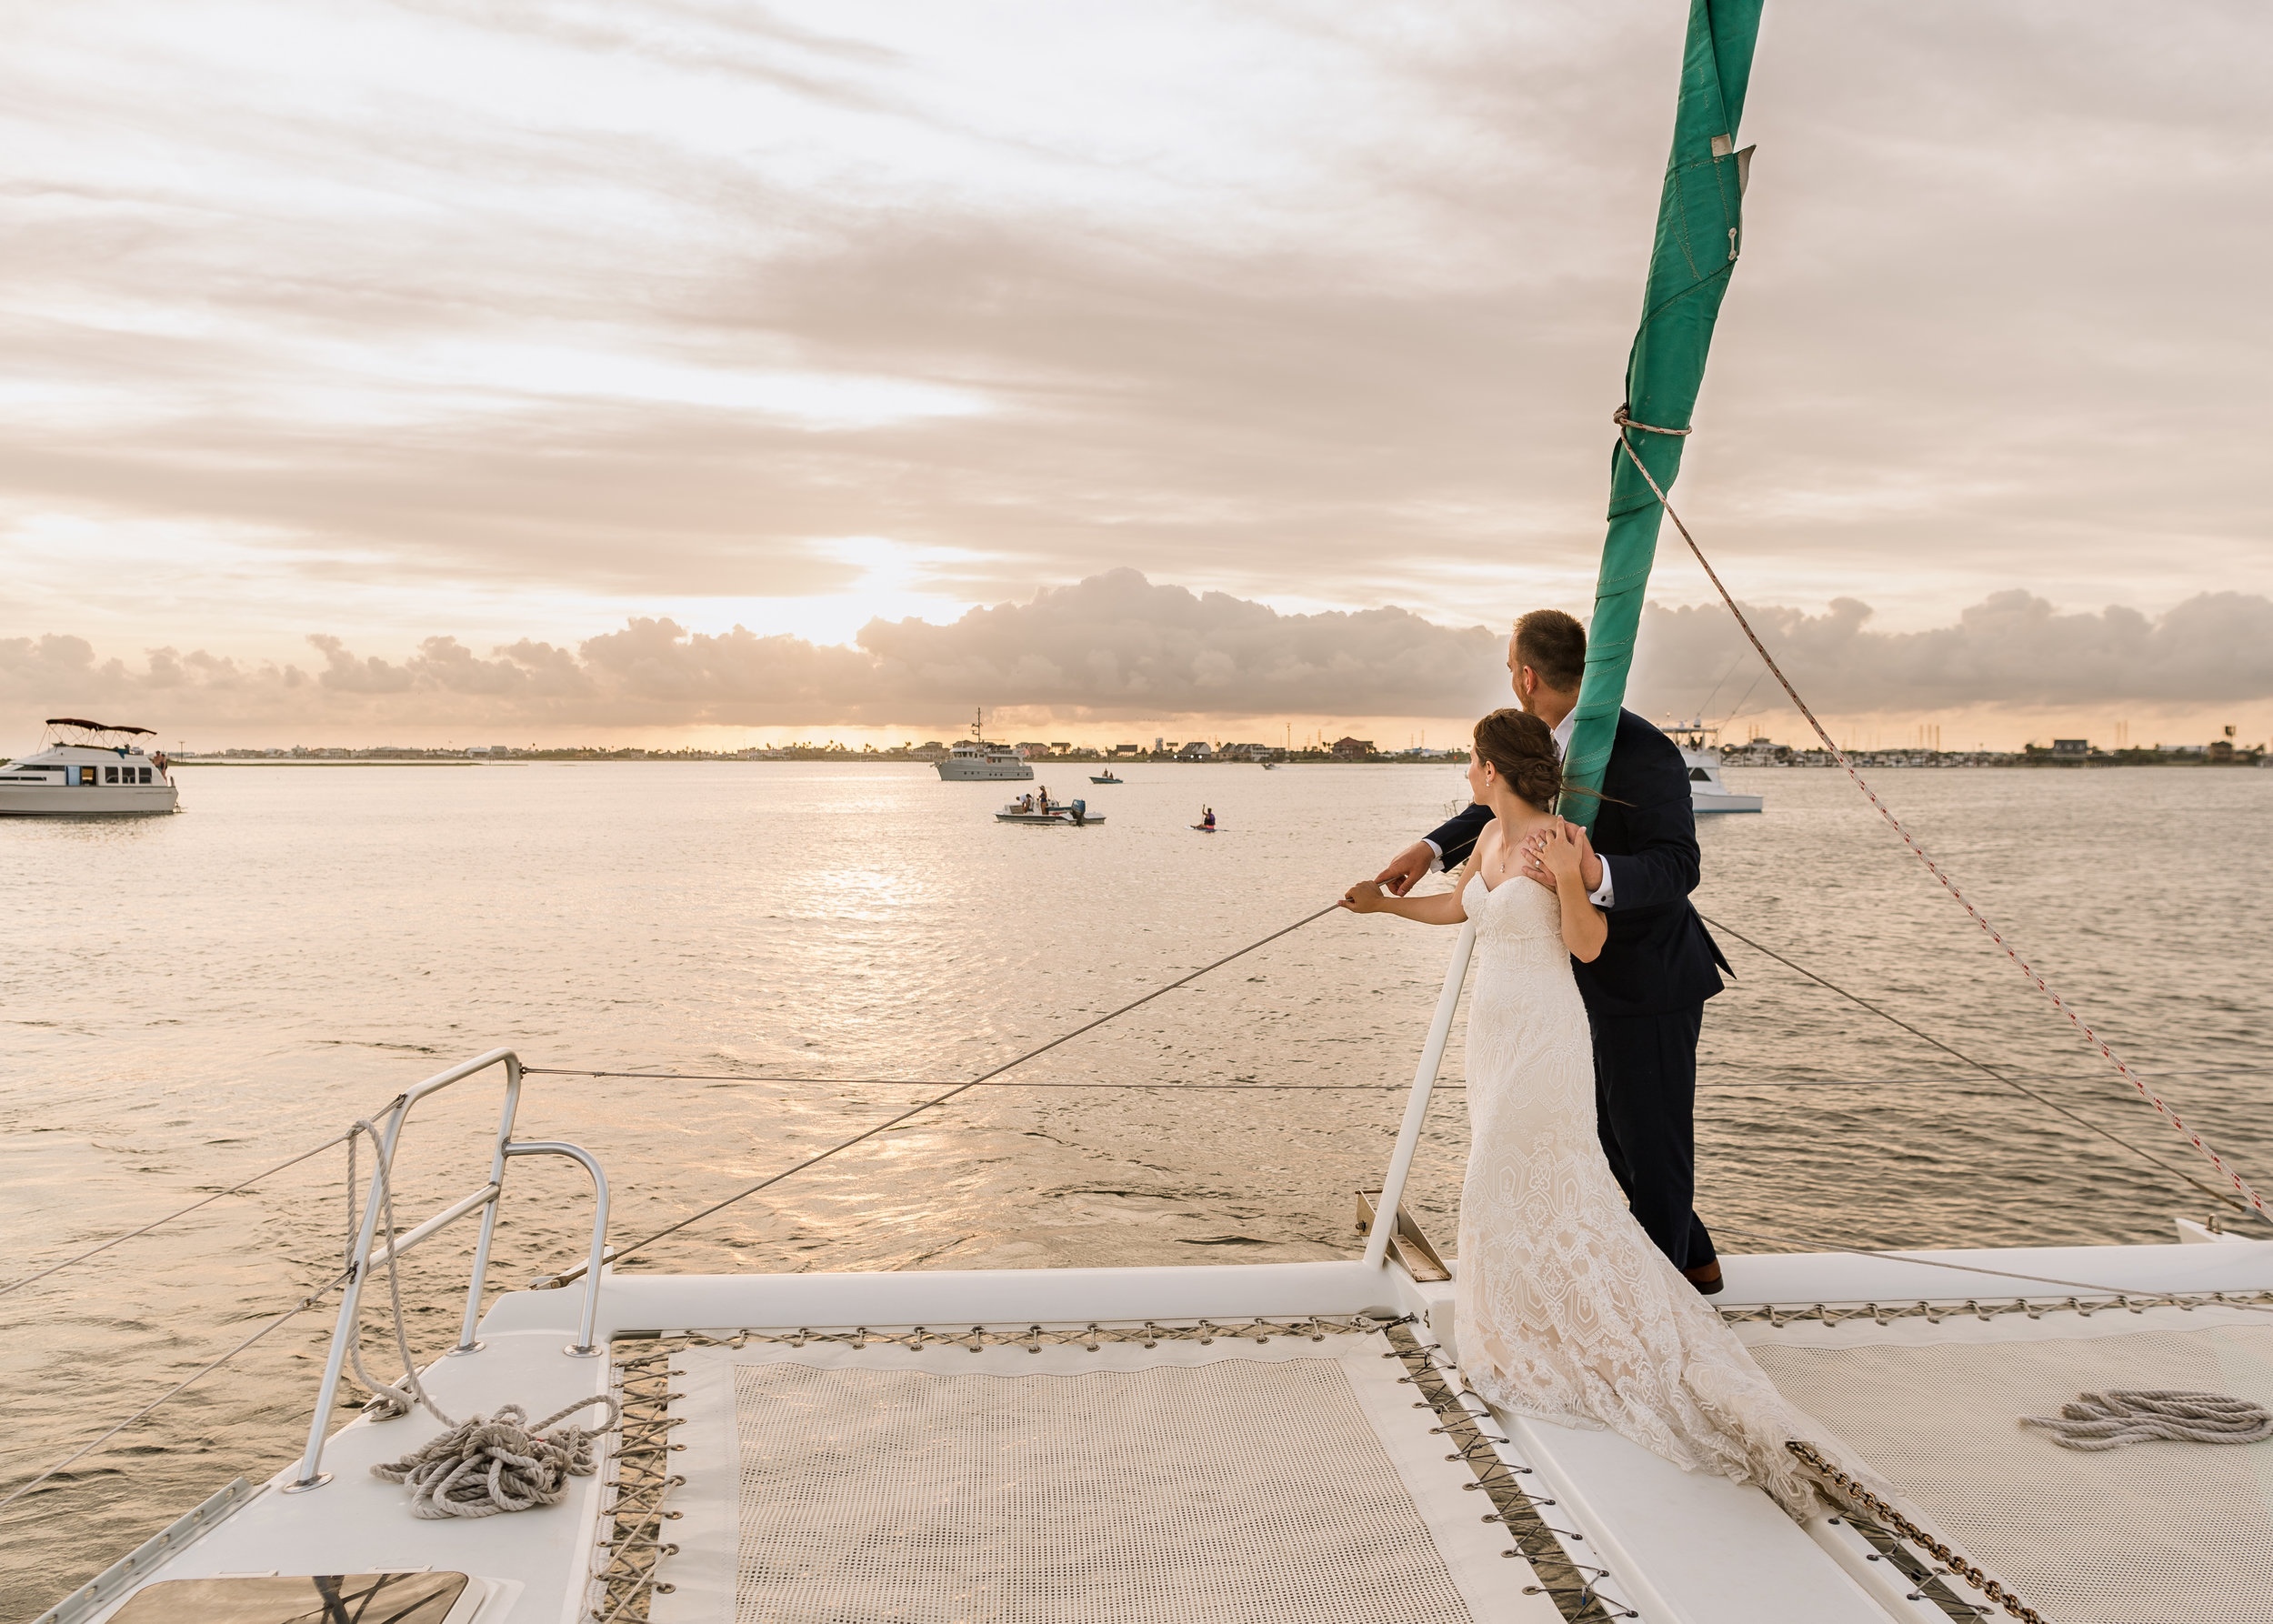 Sail-away Sunset Cruise